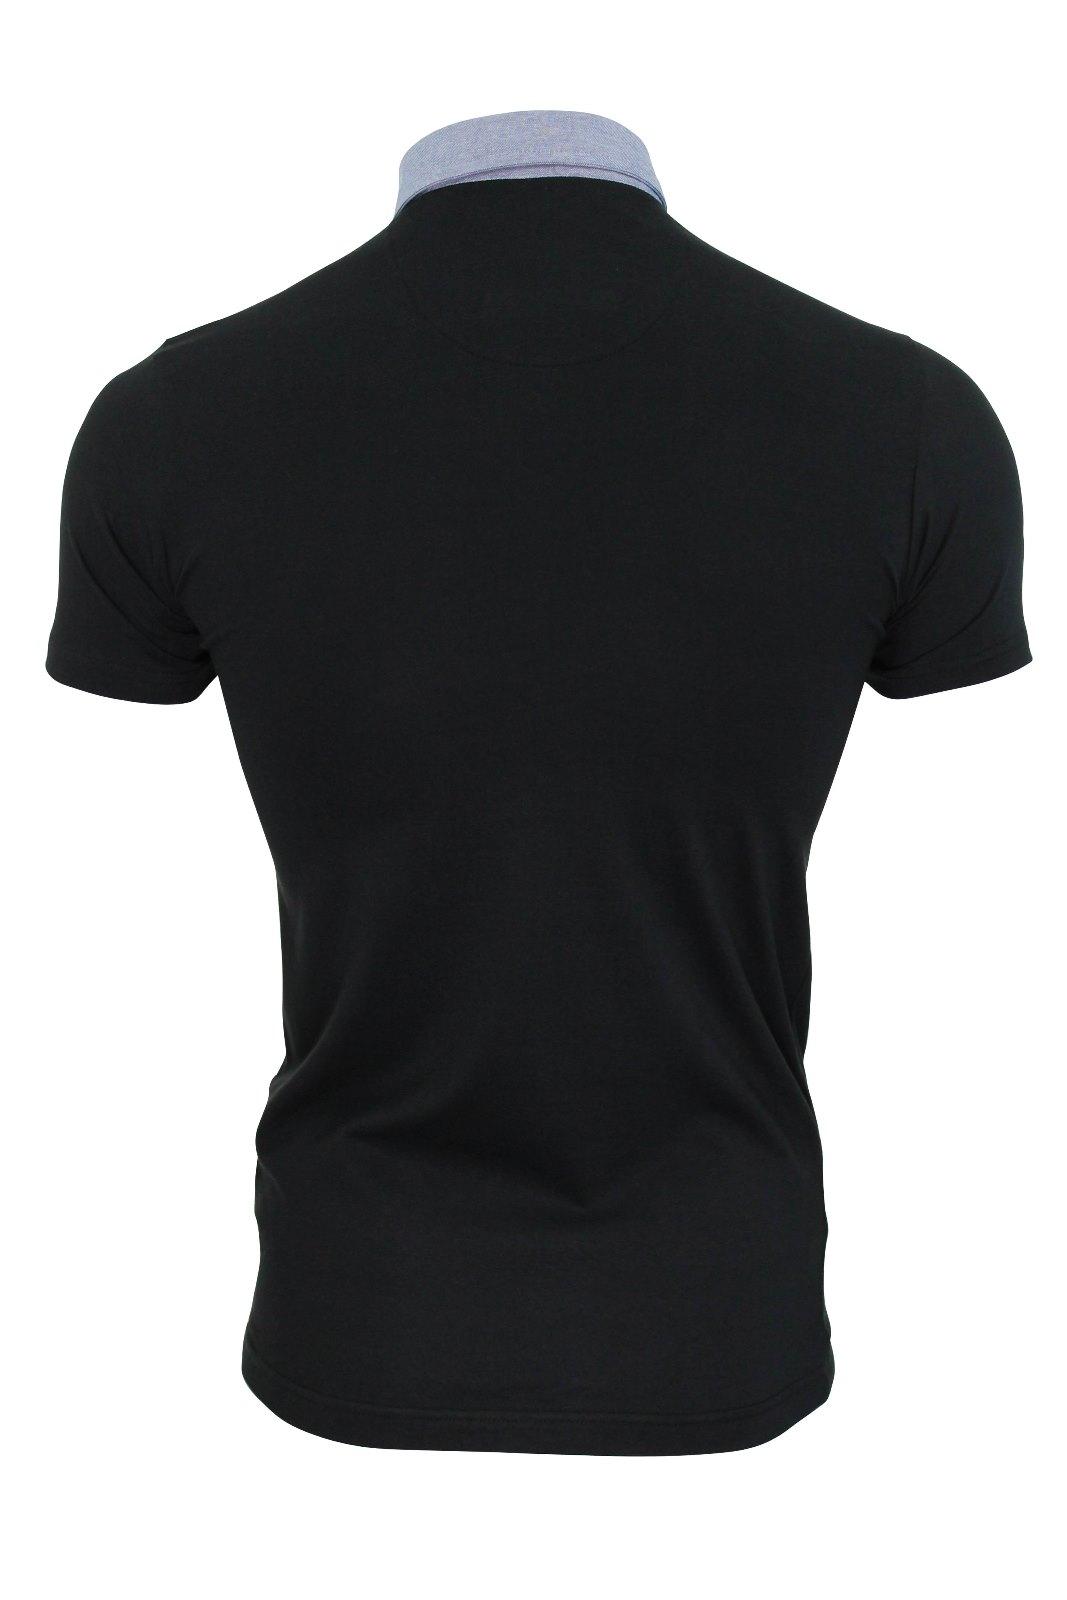 Mens-Polo-T-Shirt-Chimera-Brave-Soul-Denim-Chambray-Collar-Short-Sleeved-Cotton thumbnail 7